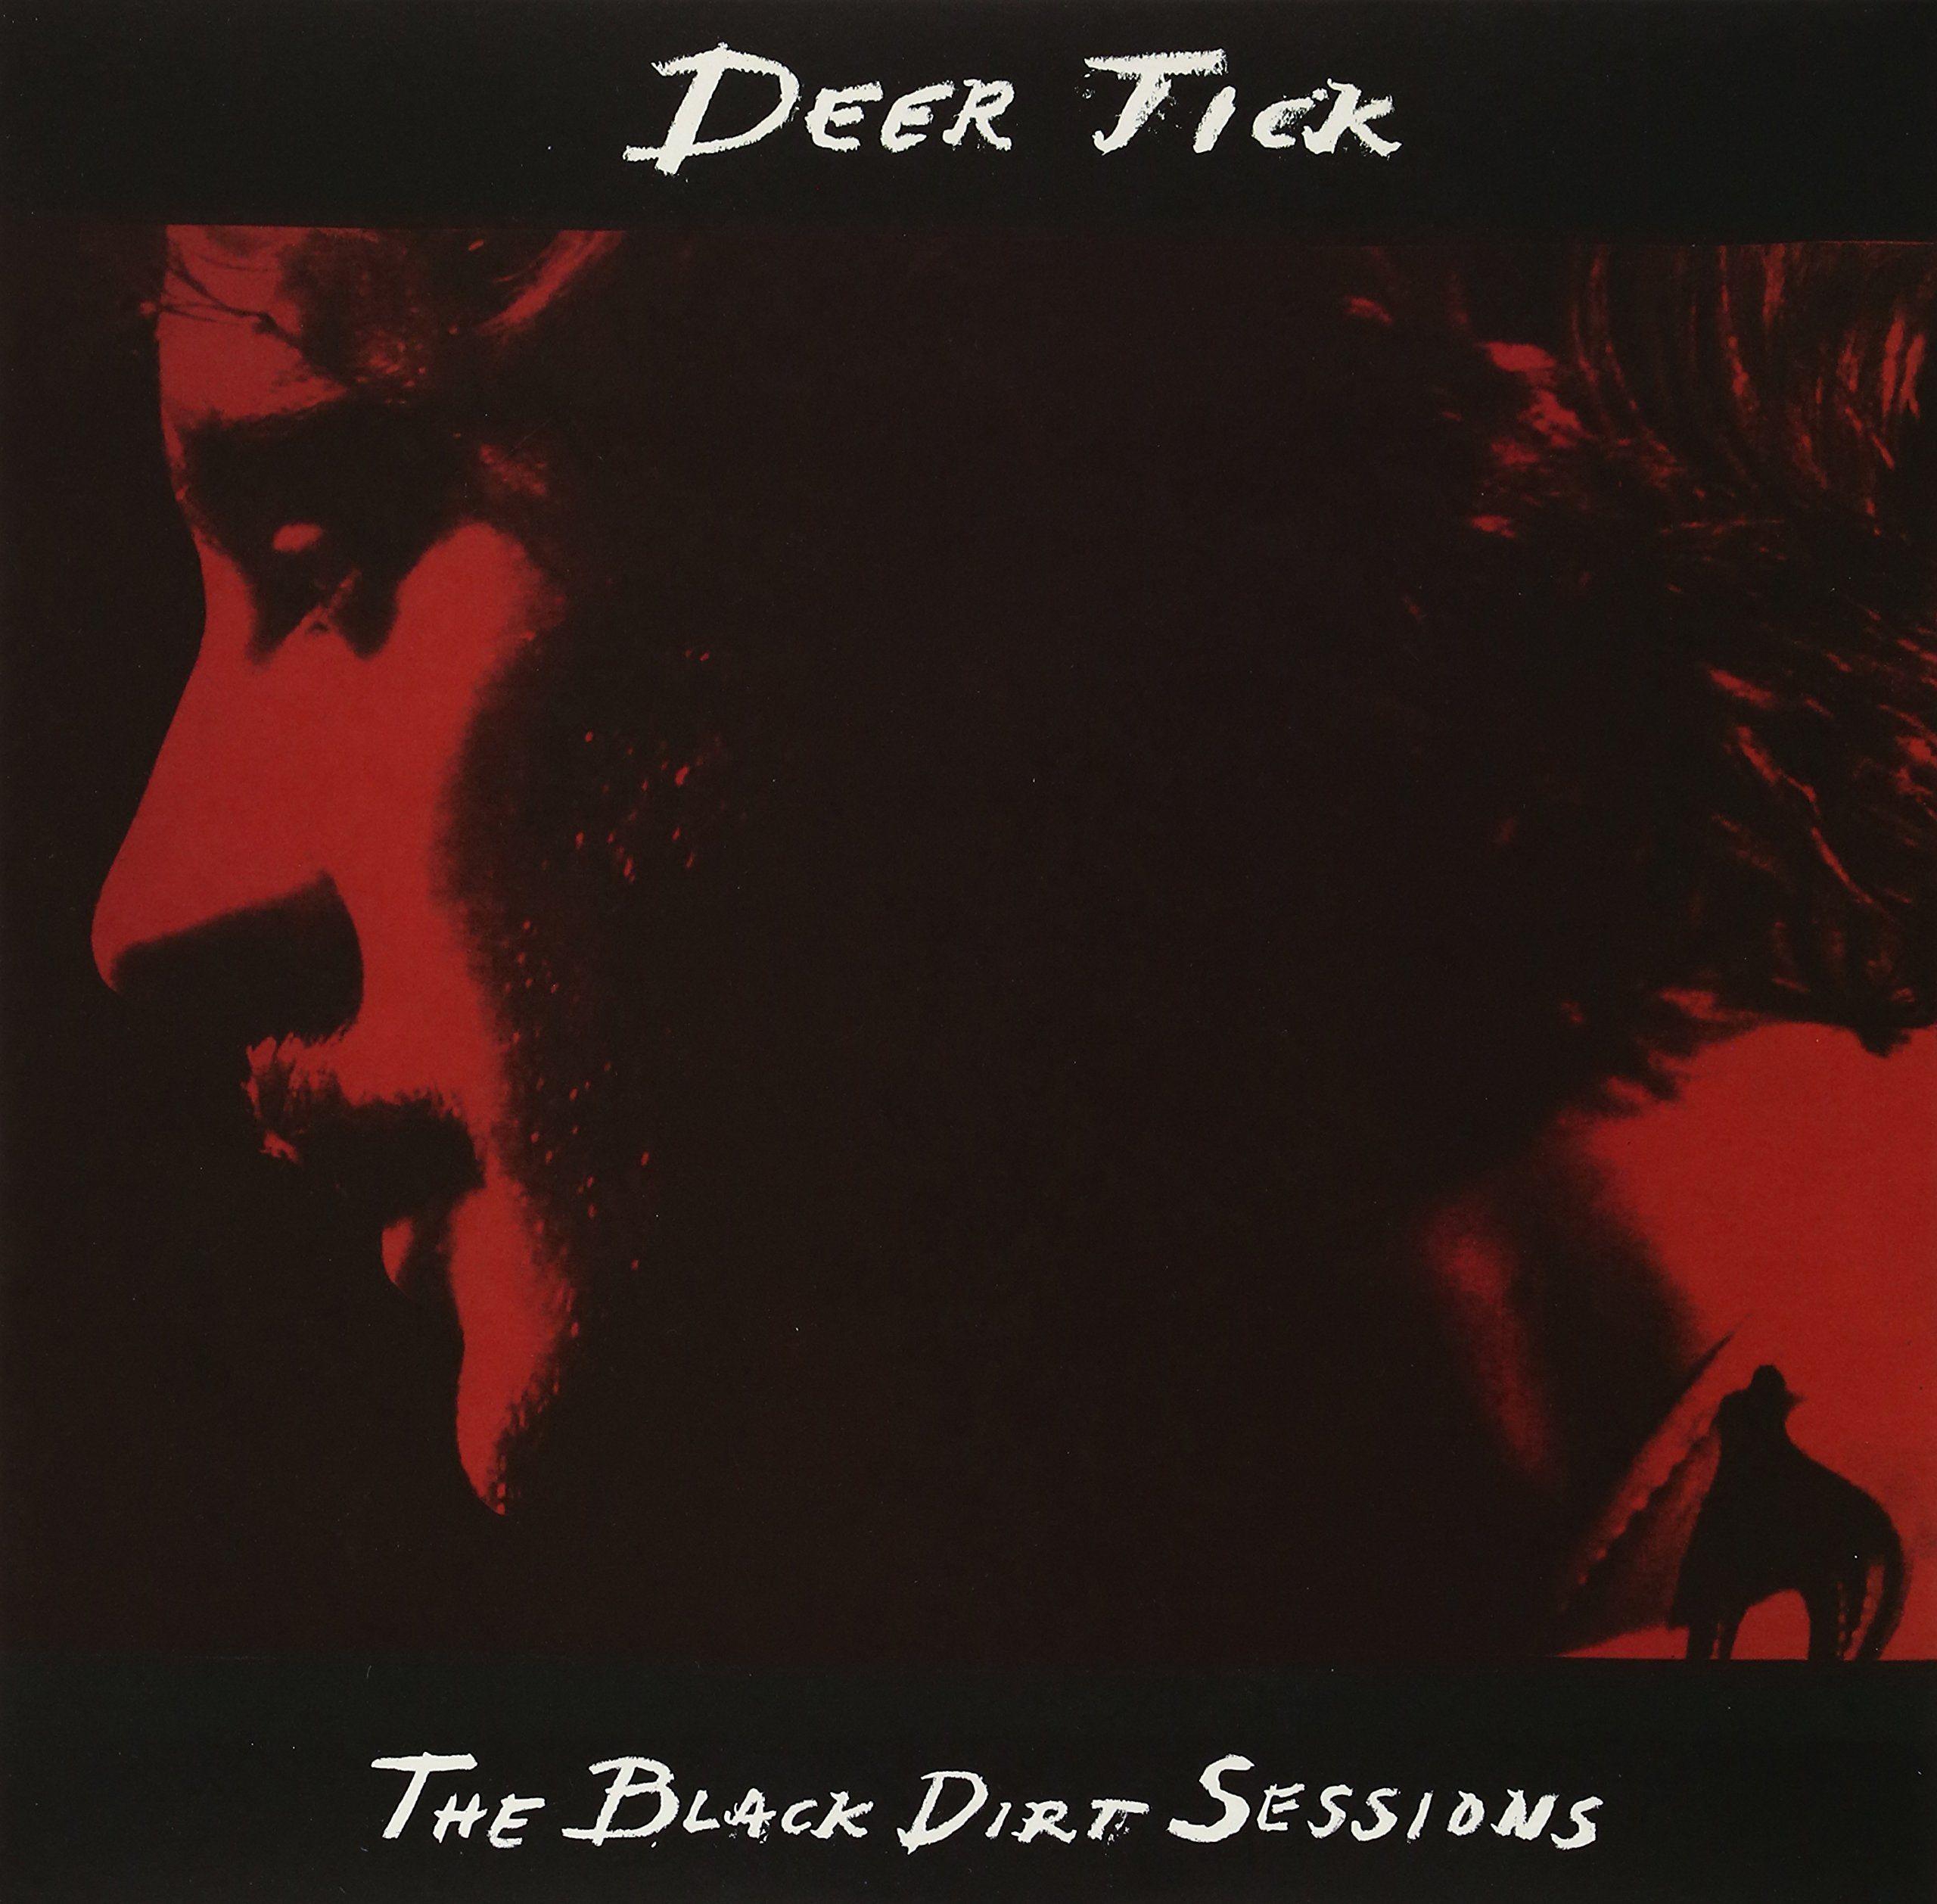 Robot Check Deer Ticks Lp Vinyl Session